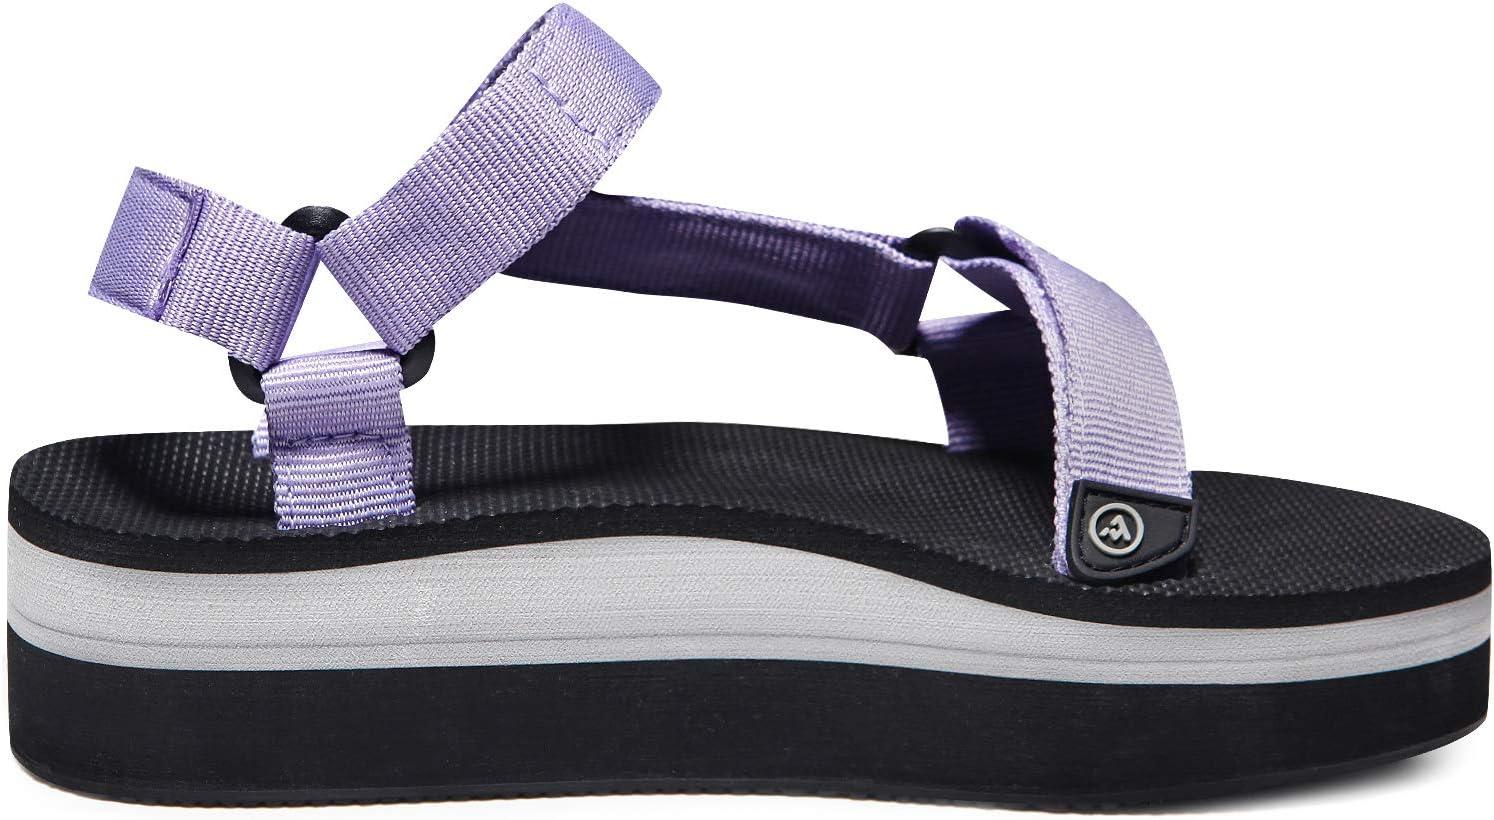 ATIKA Womens Islander Trail Outdoor Water Shoes Strap Sport Sandals